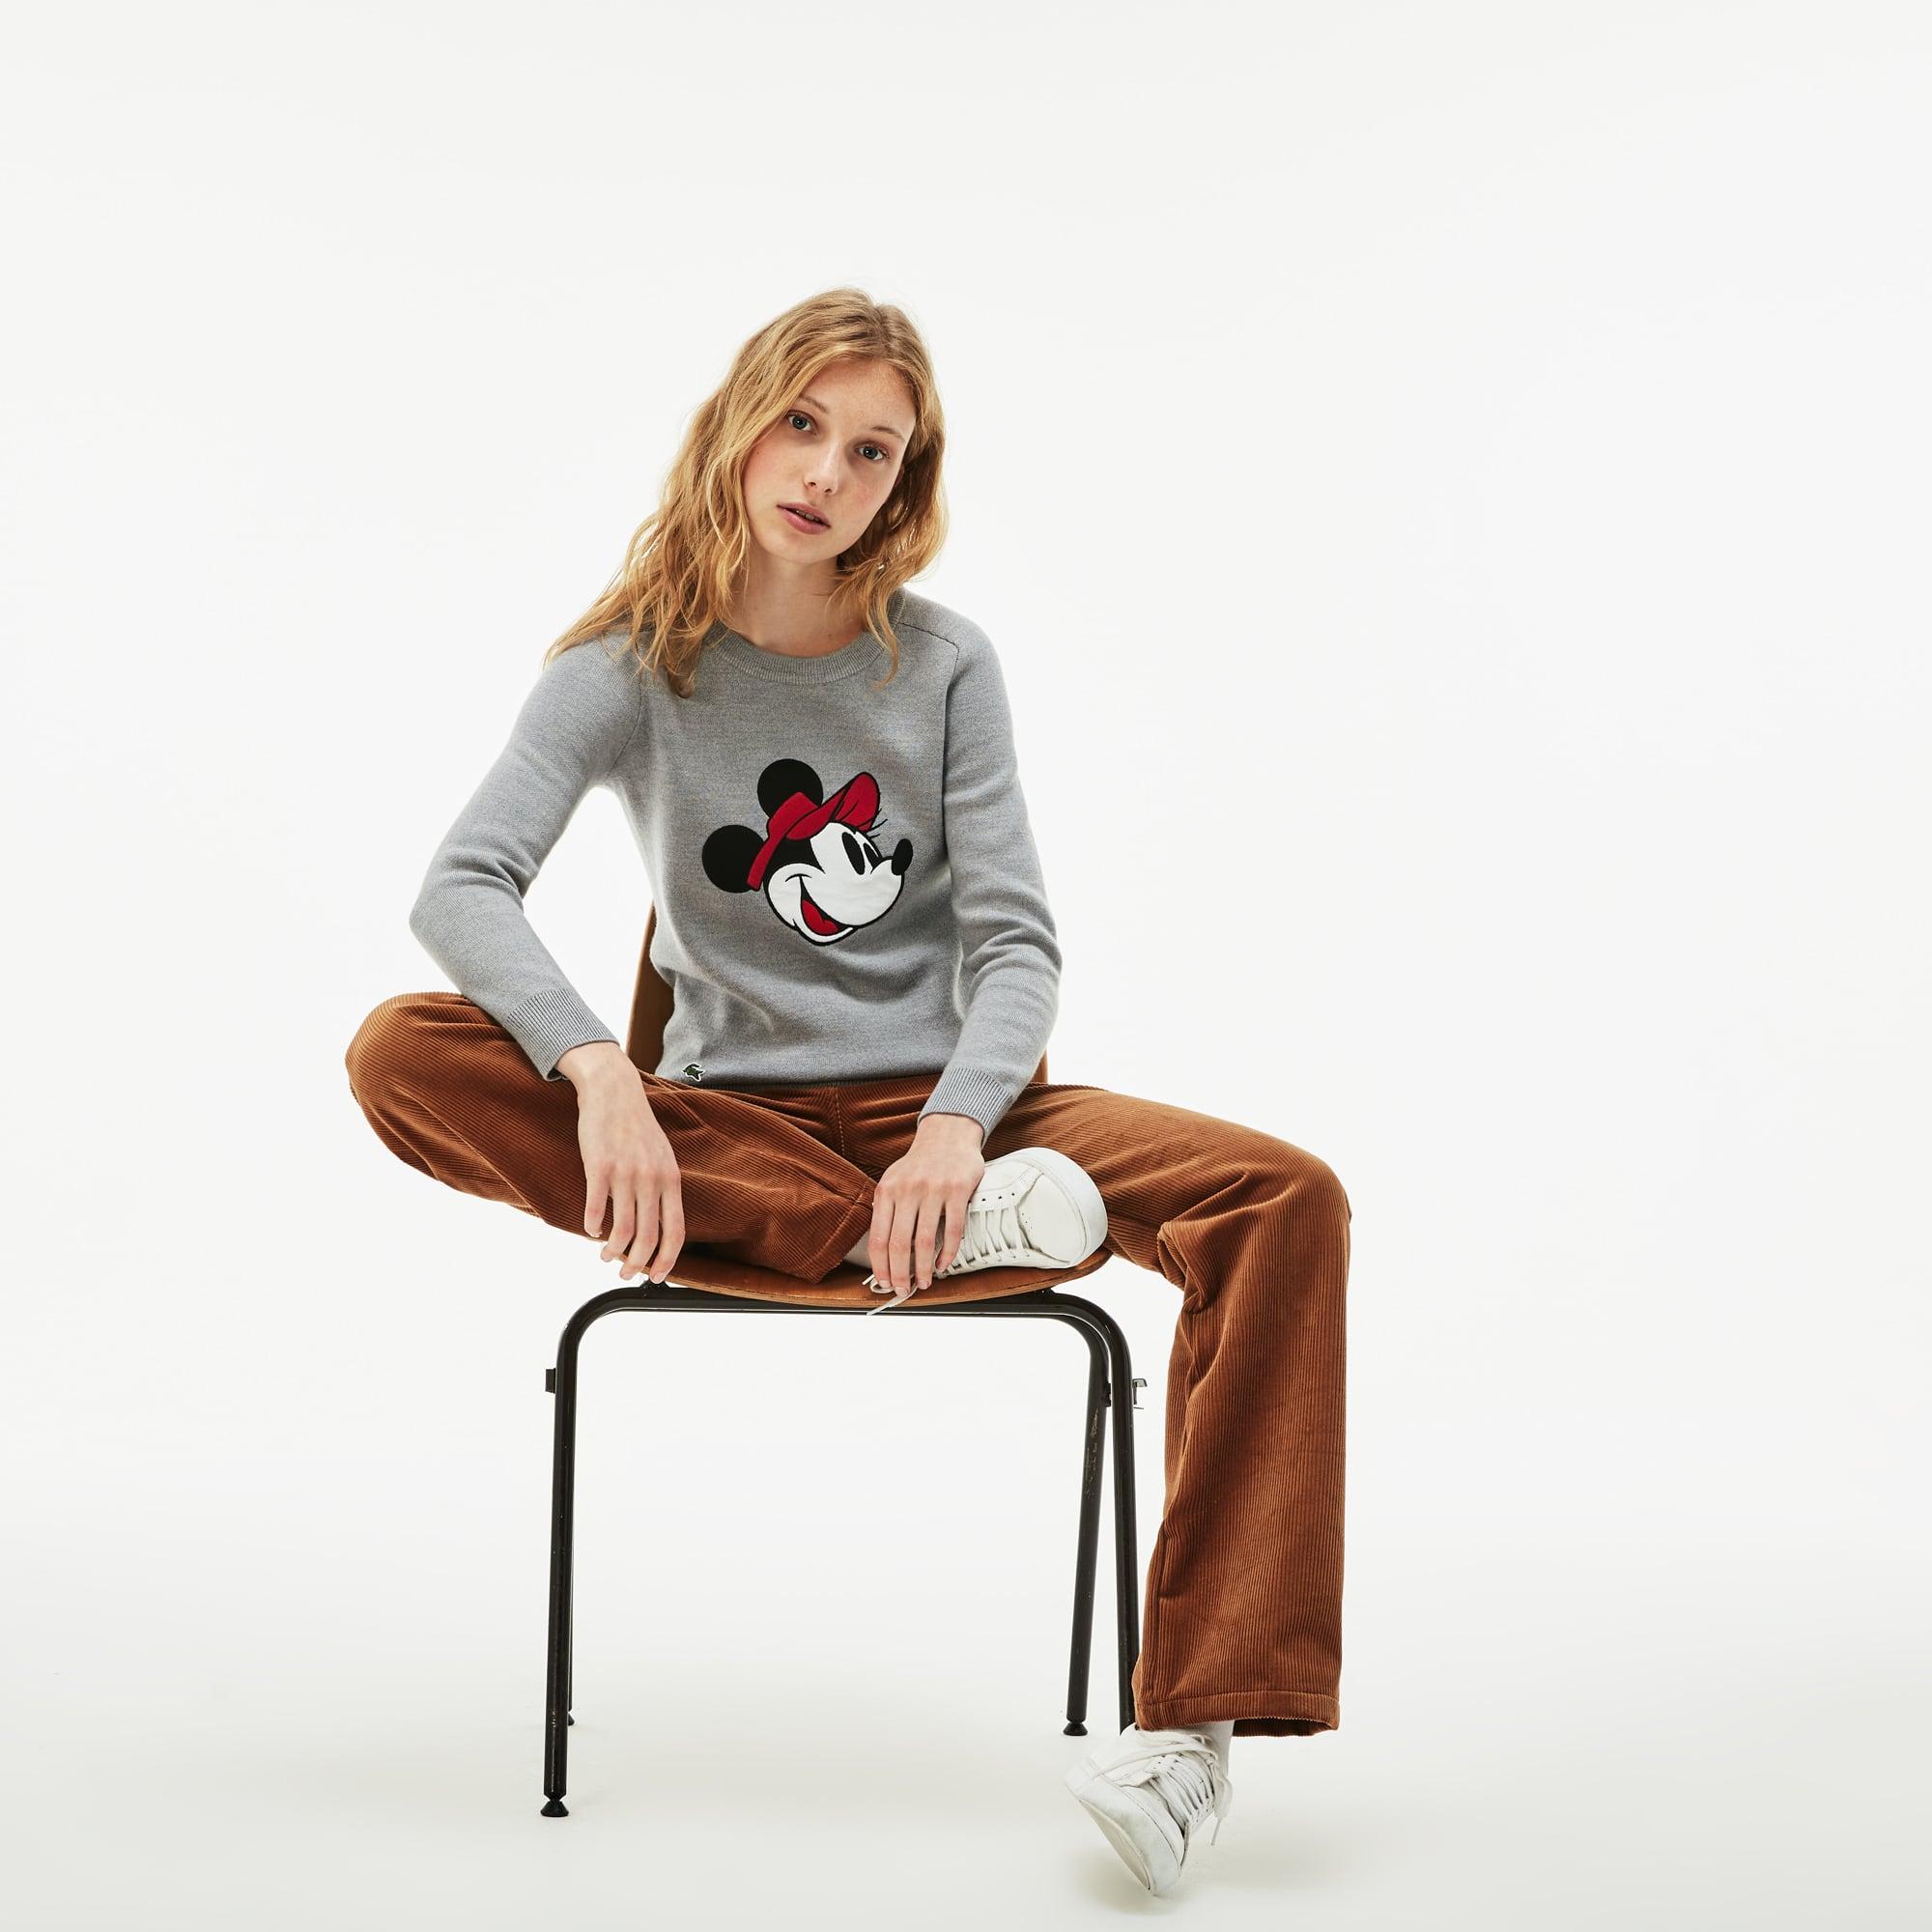 Women's Crew Neck Disney Minnie Embroidery Interlock Sweater